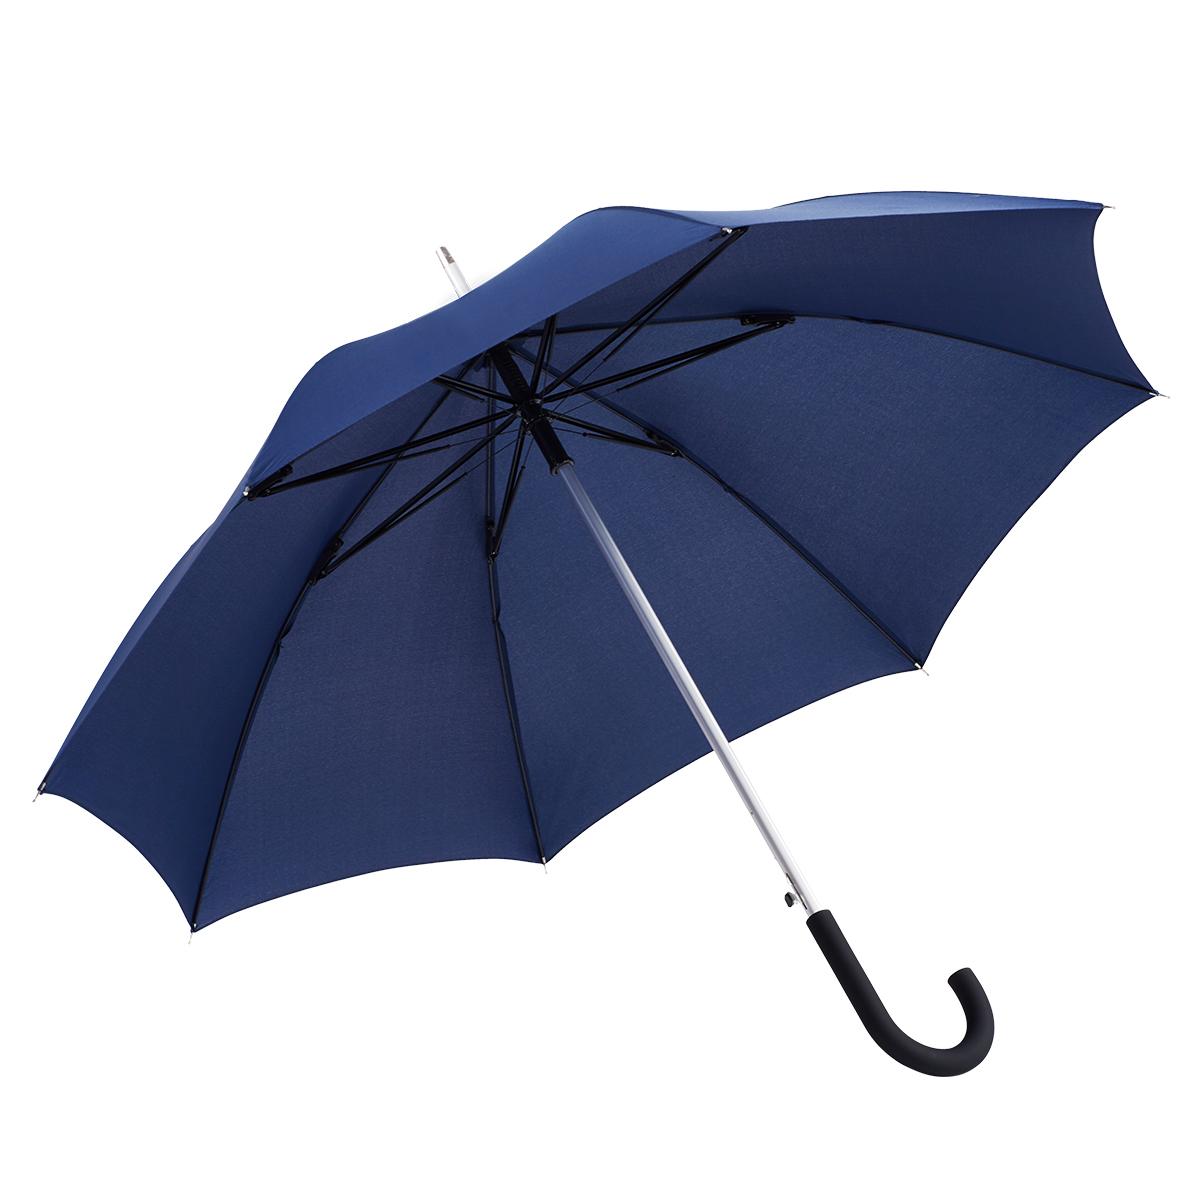 Stick Alu Umbrella (1)